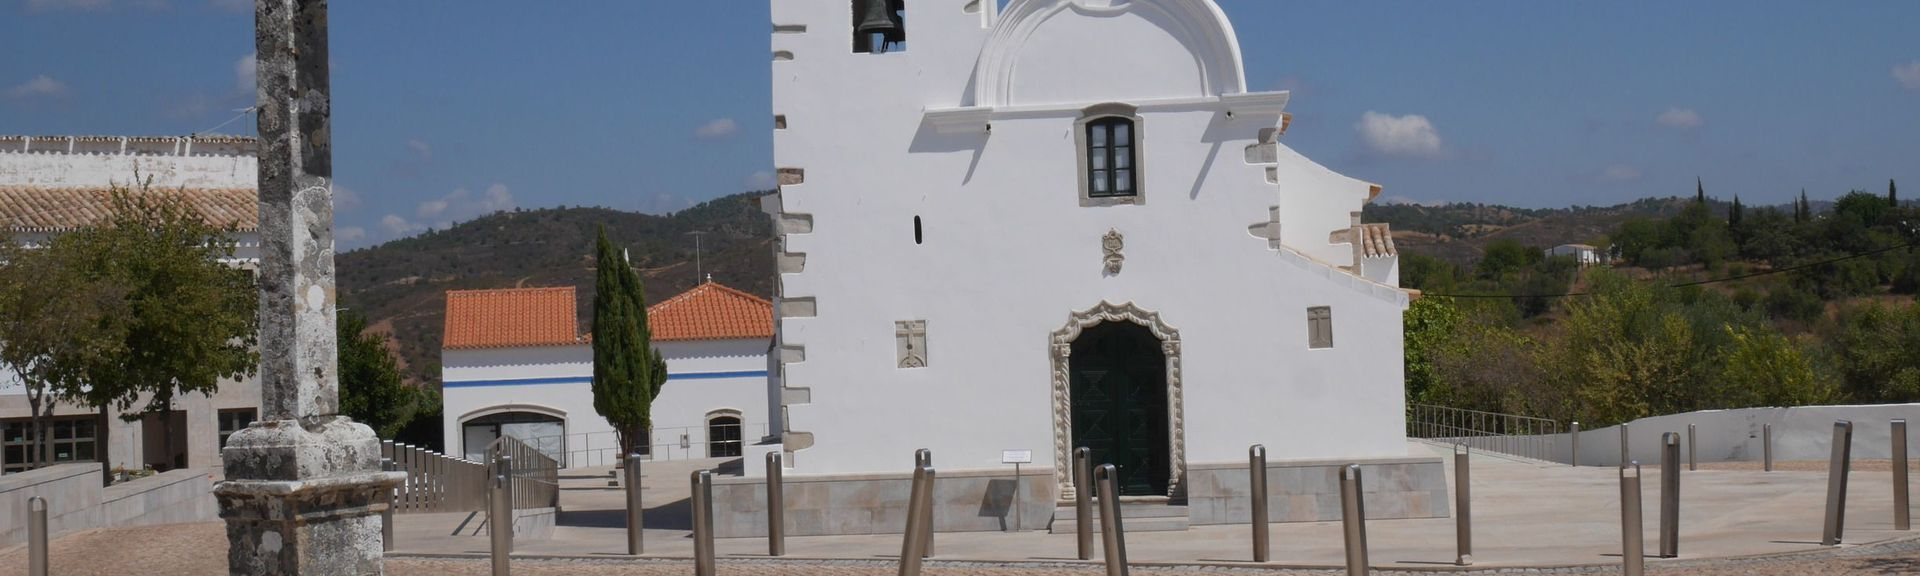 Loule, Faron piiri, Portugali